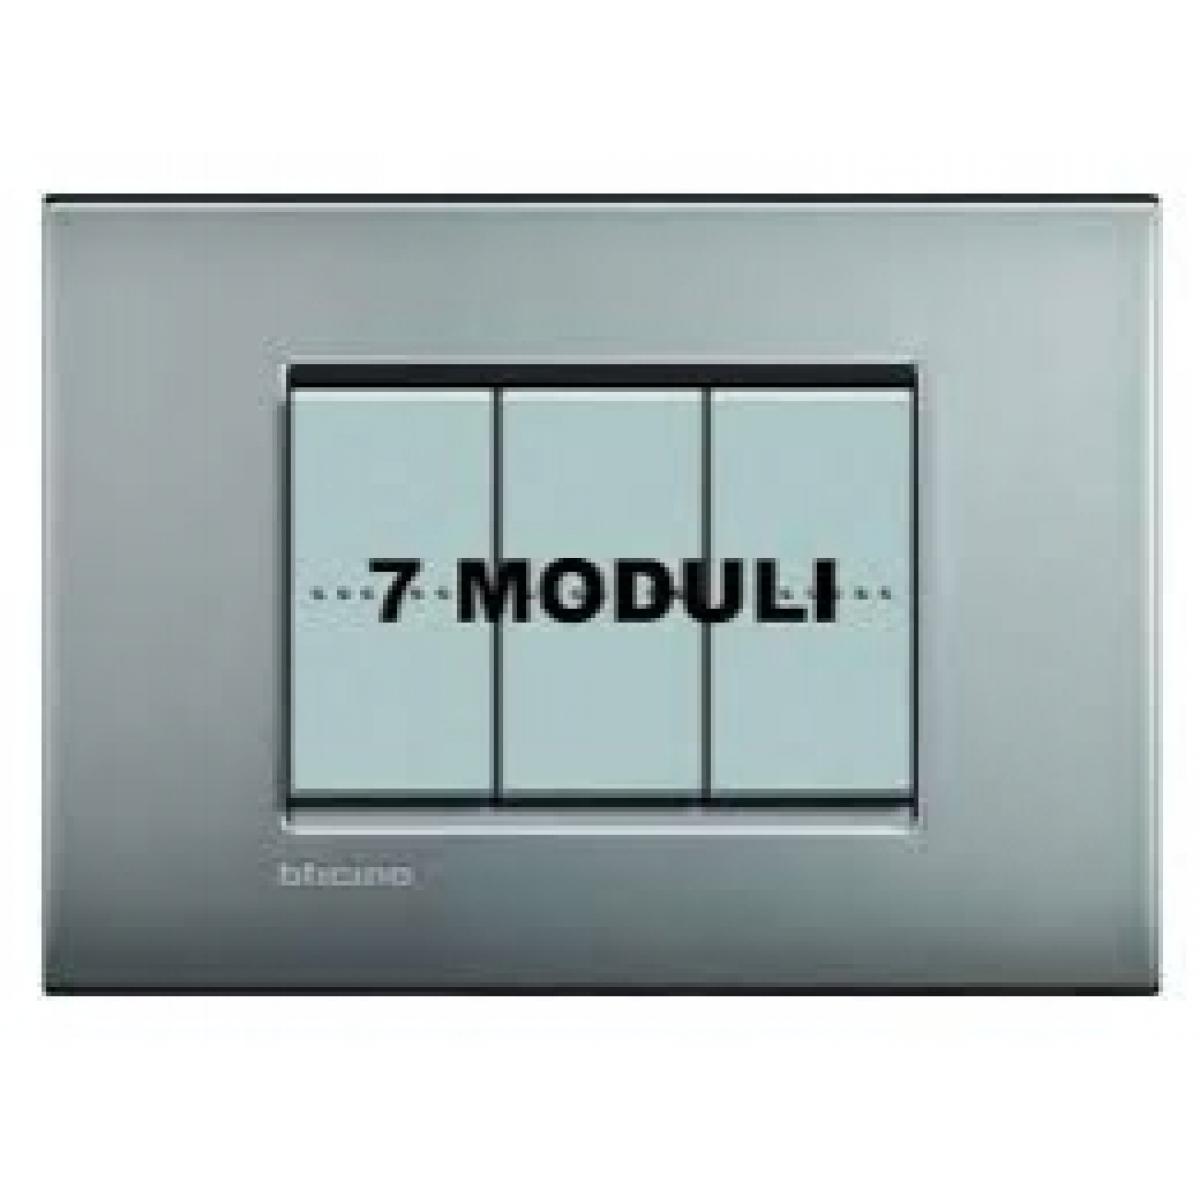 Placca 7 Moduli Nickel Mat Bticino Living Air LNC4807NK